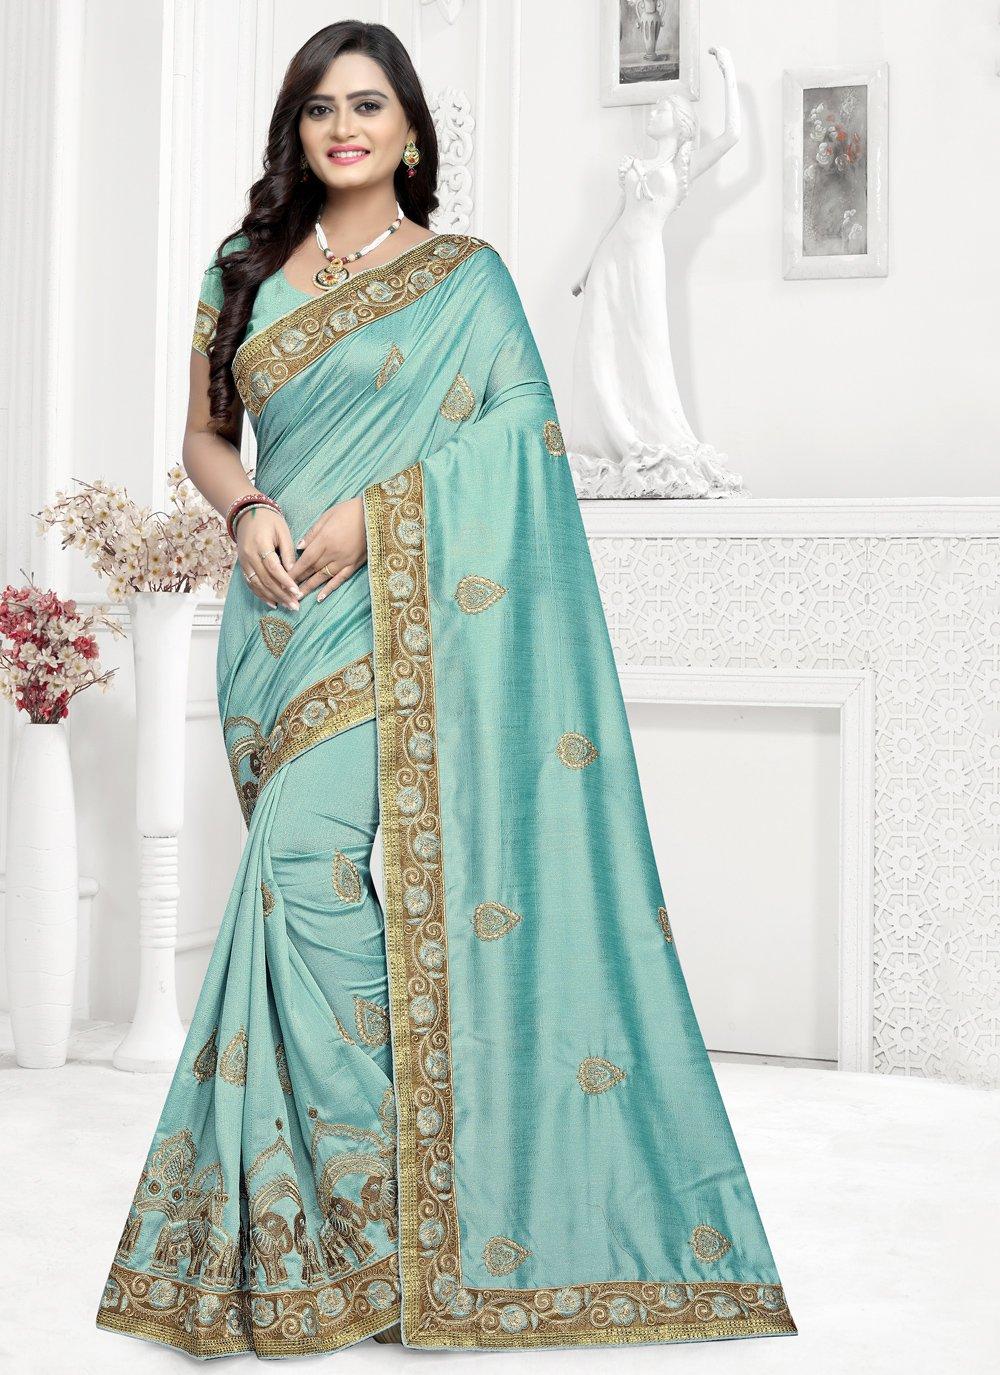 Saree Embroidered Silk in Aqua Blue